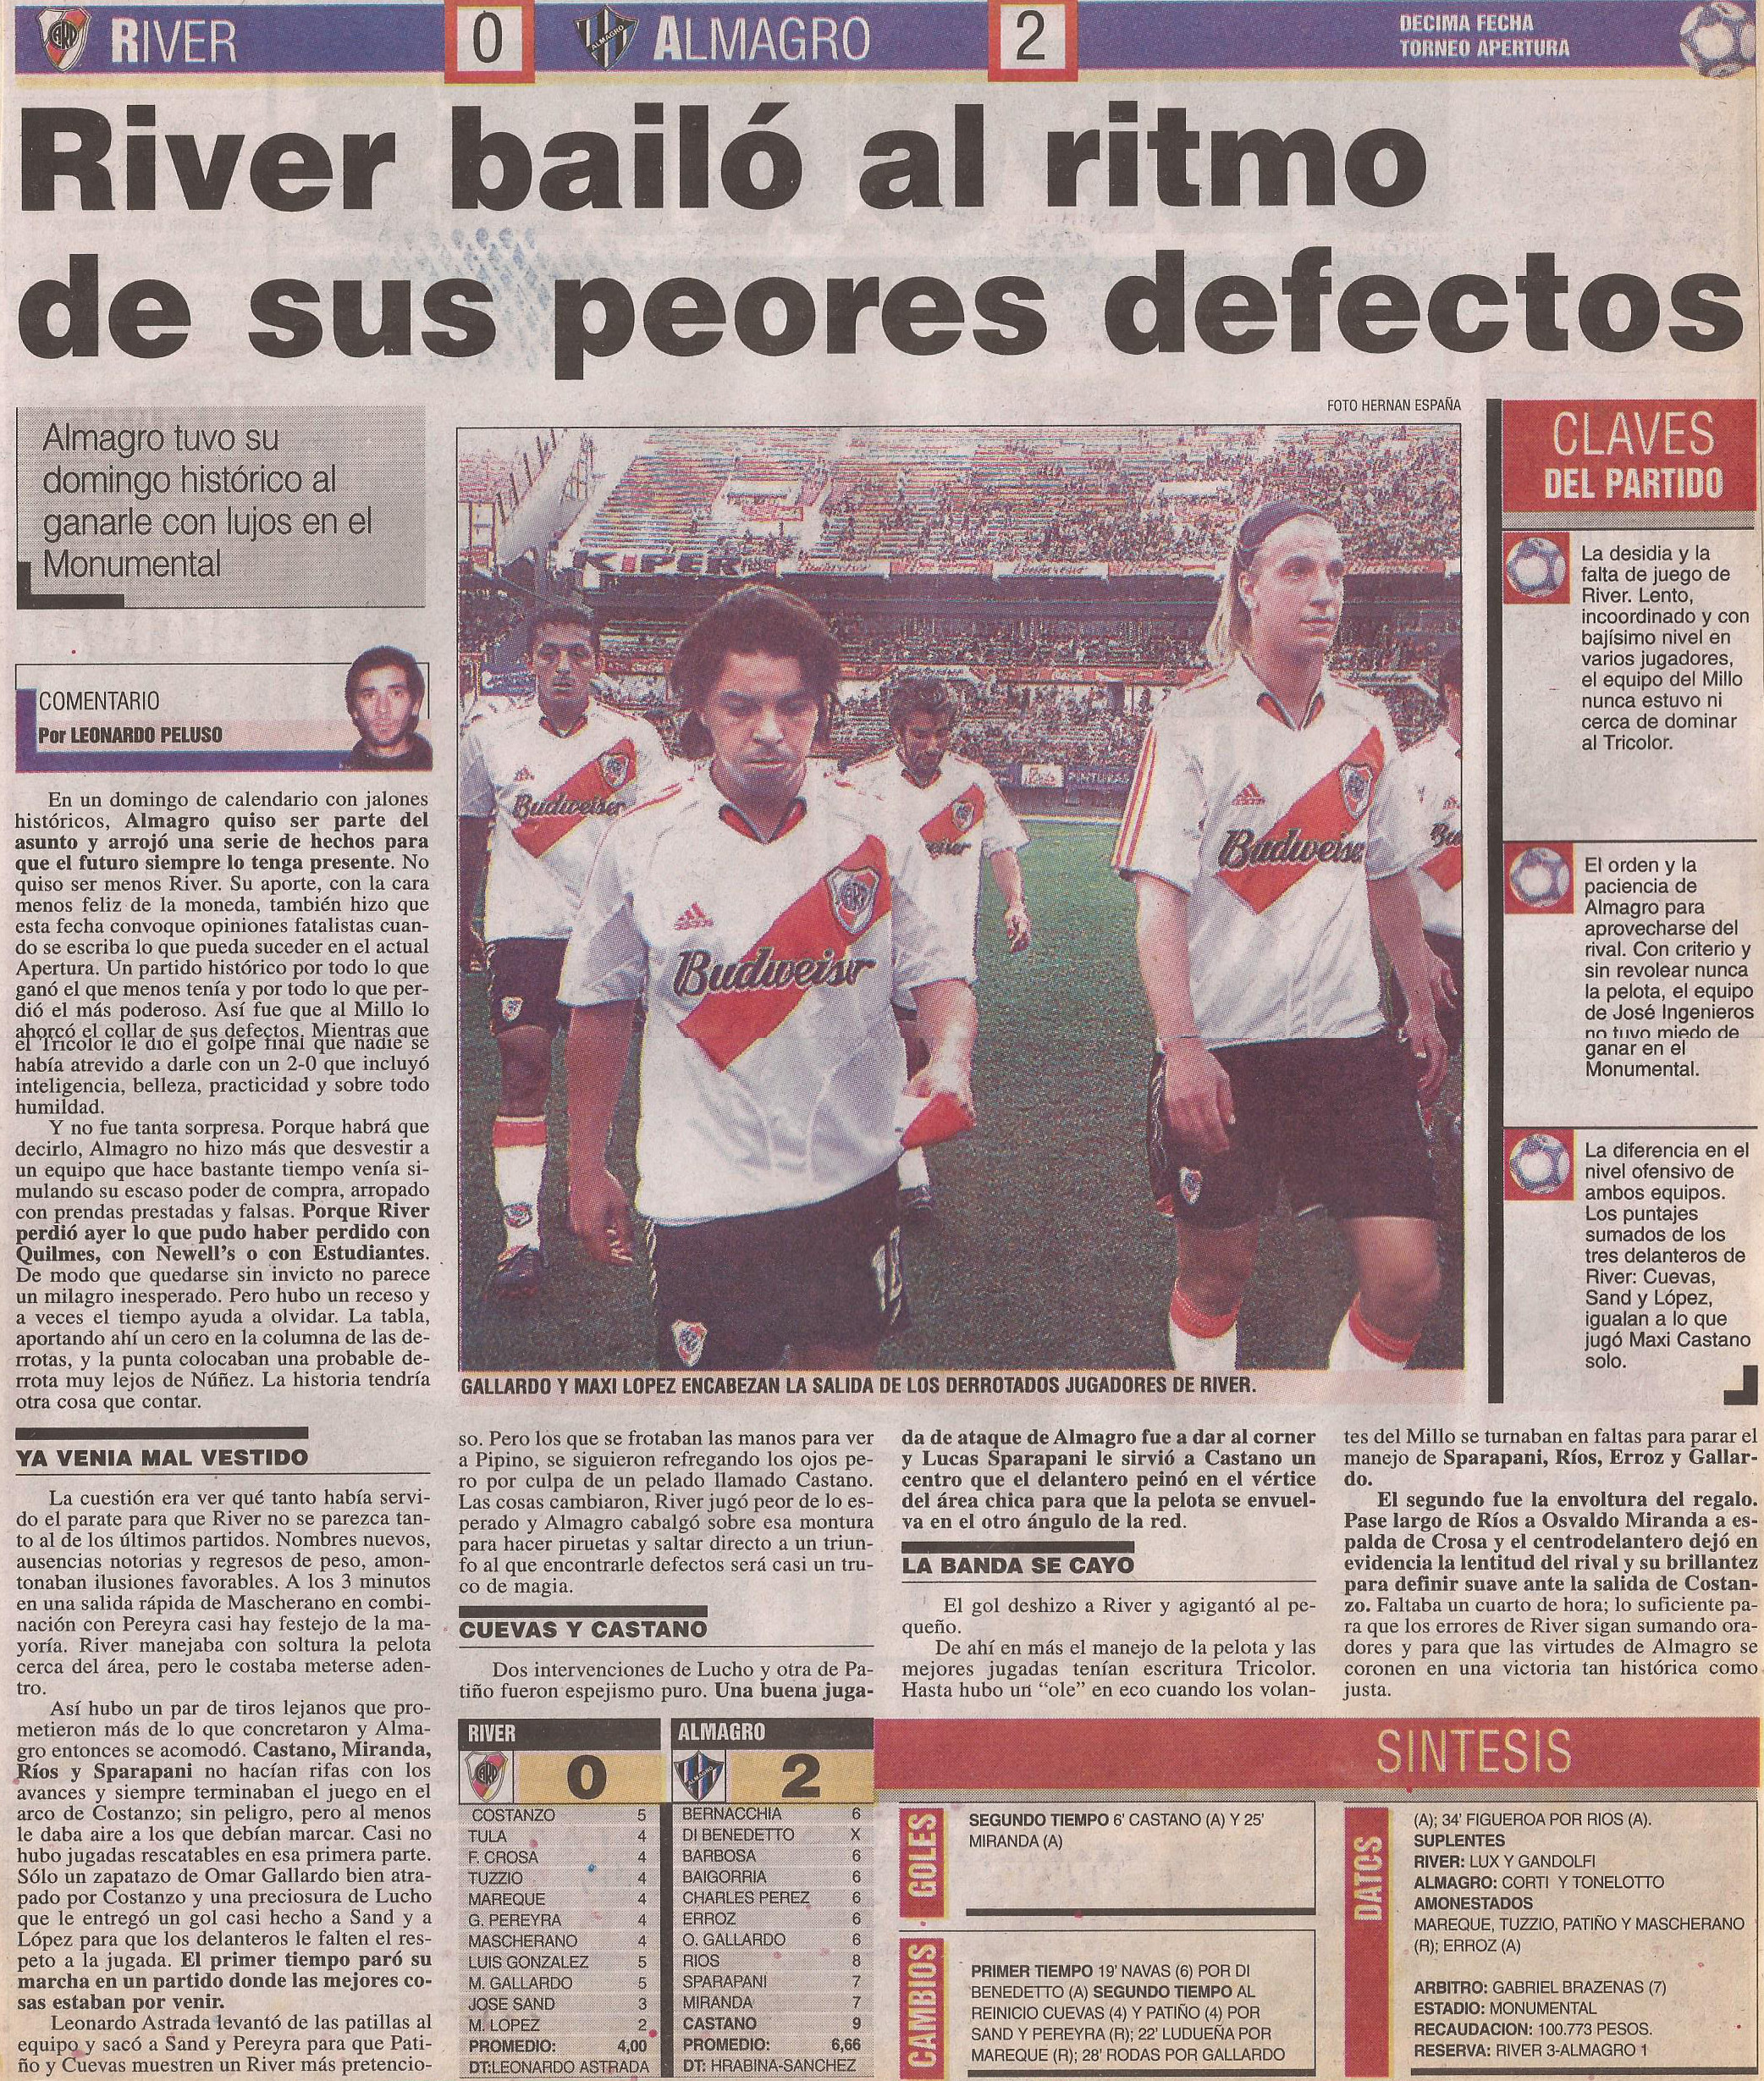 2004-05 Primera Division - River Plate vs Almagro - Diario Popular